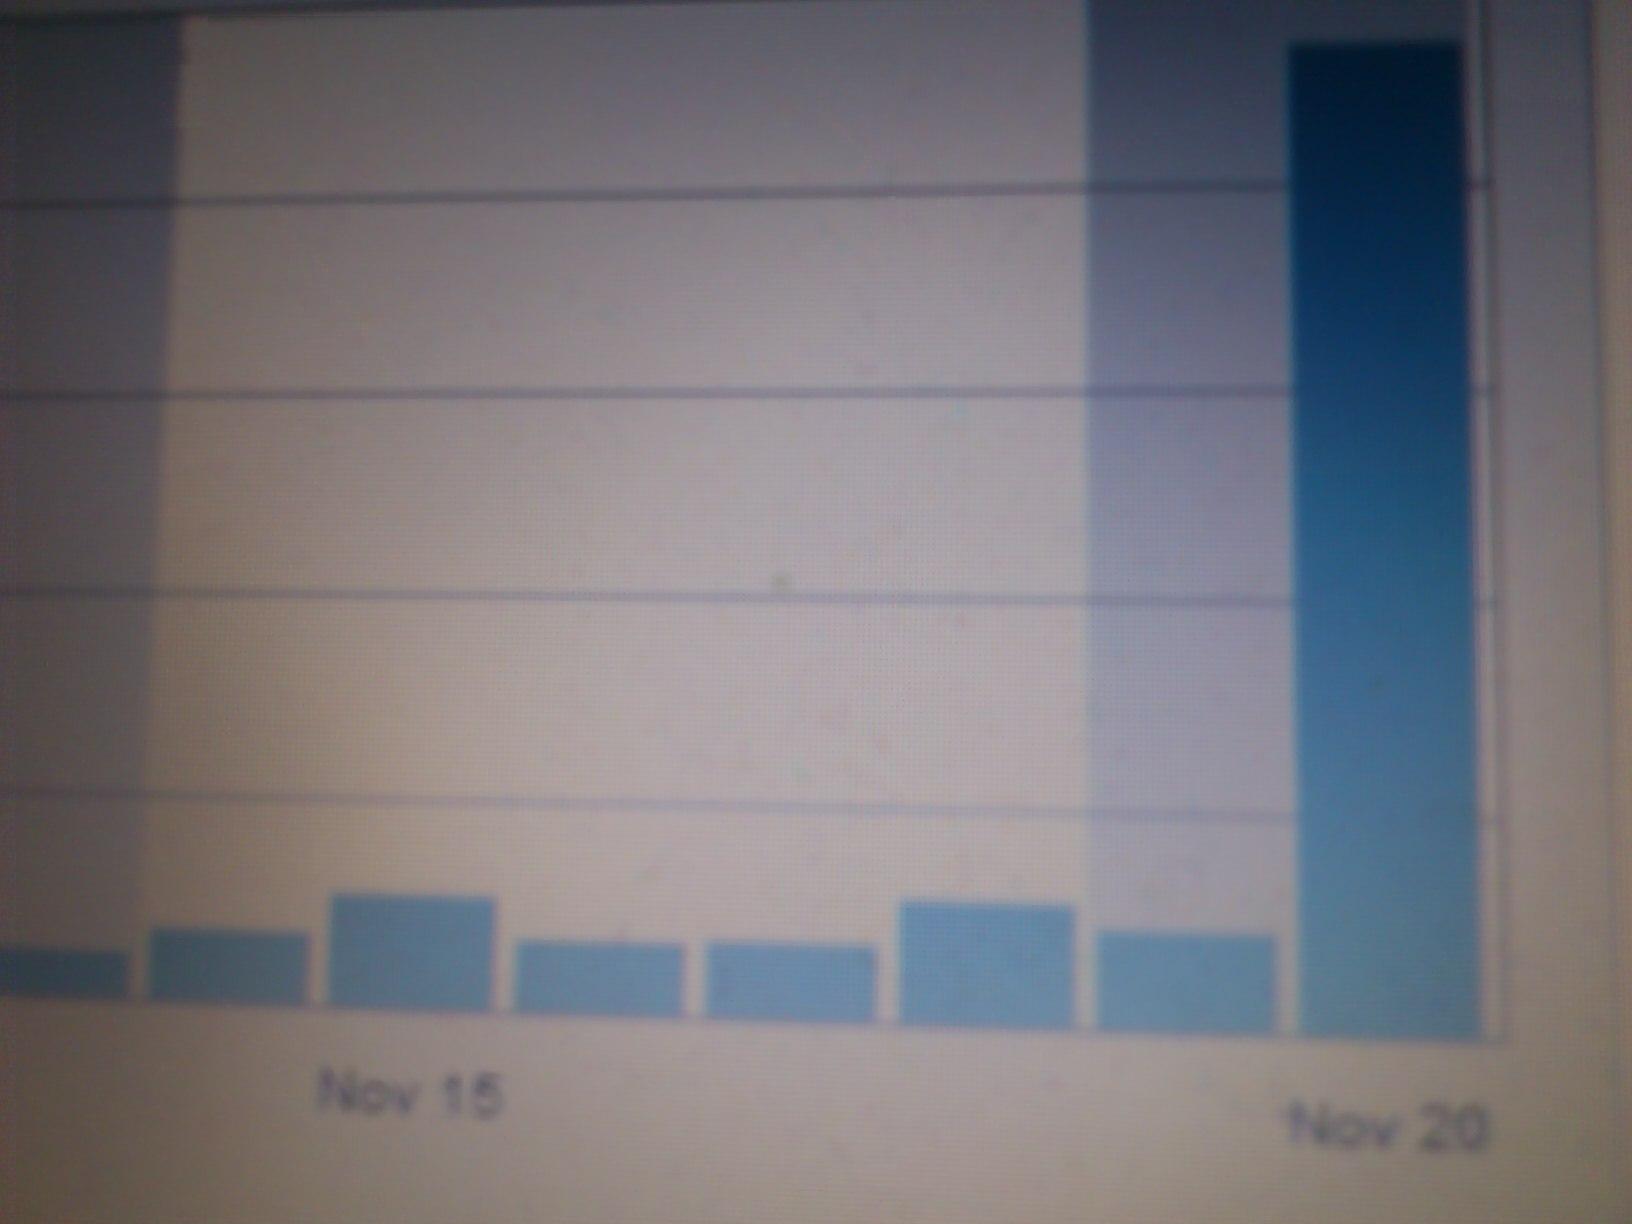 Statistik efter DN artikeln 20/11-11